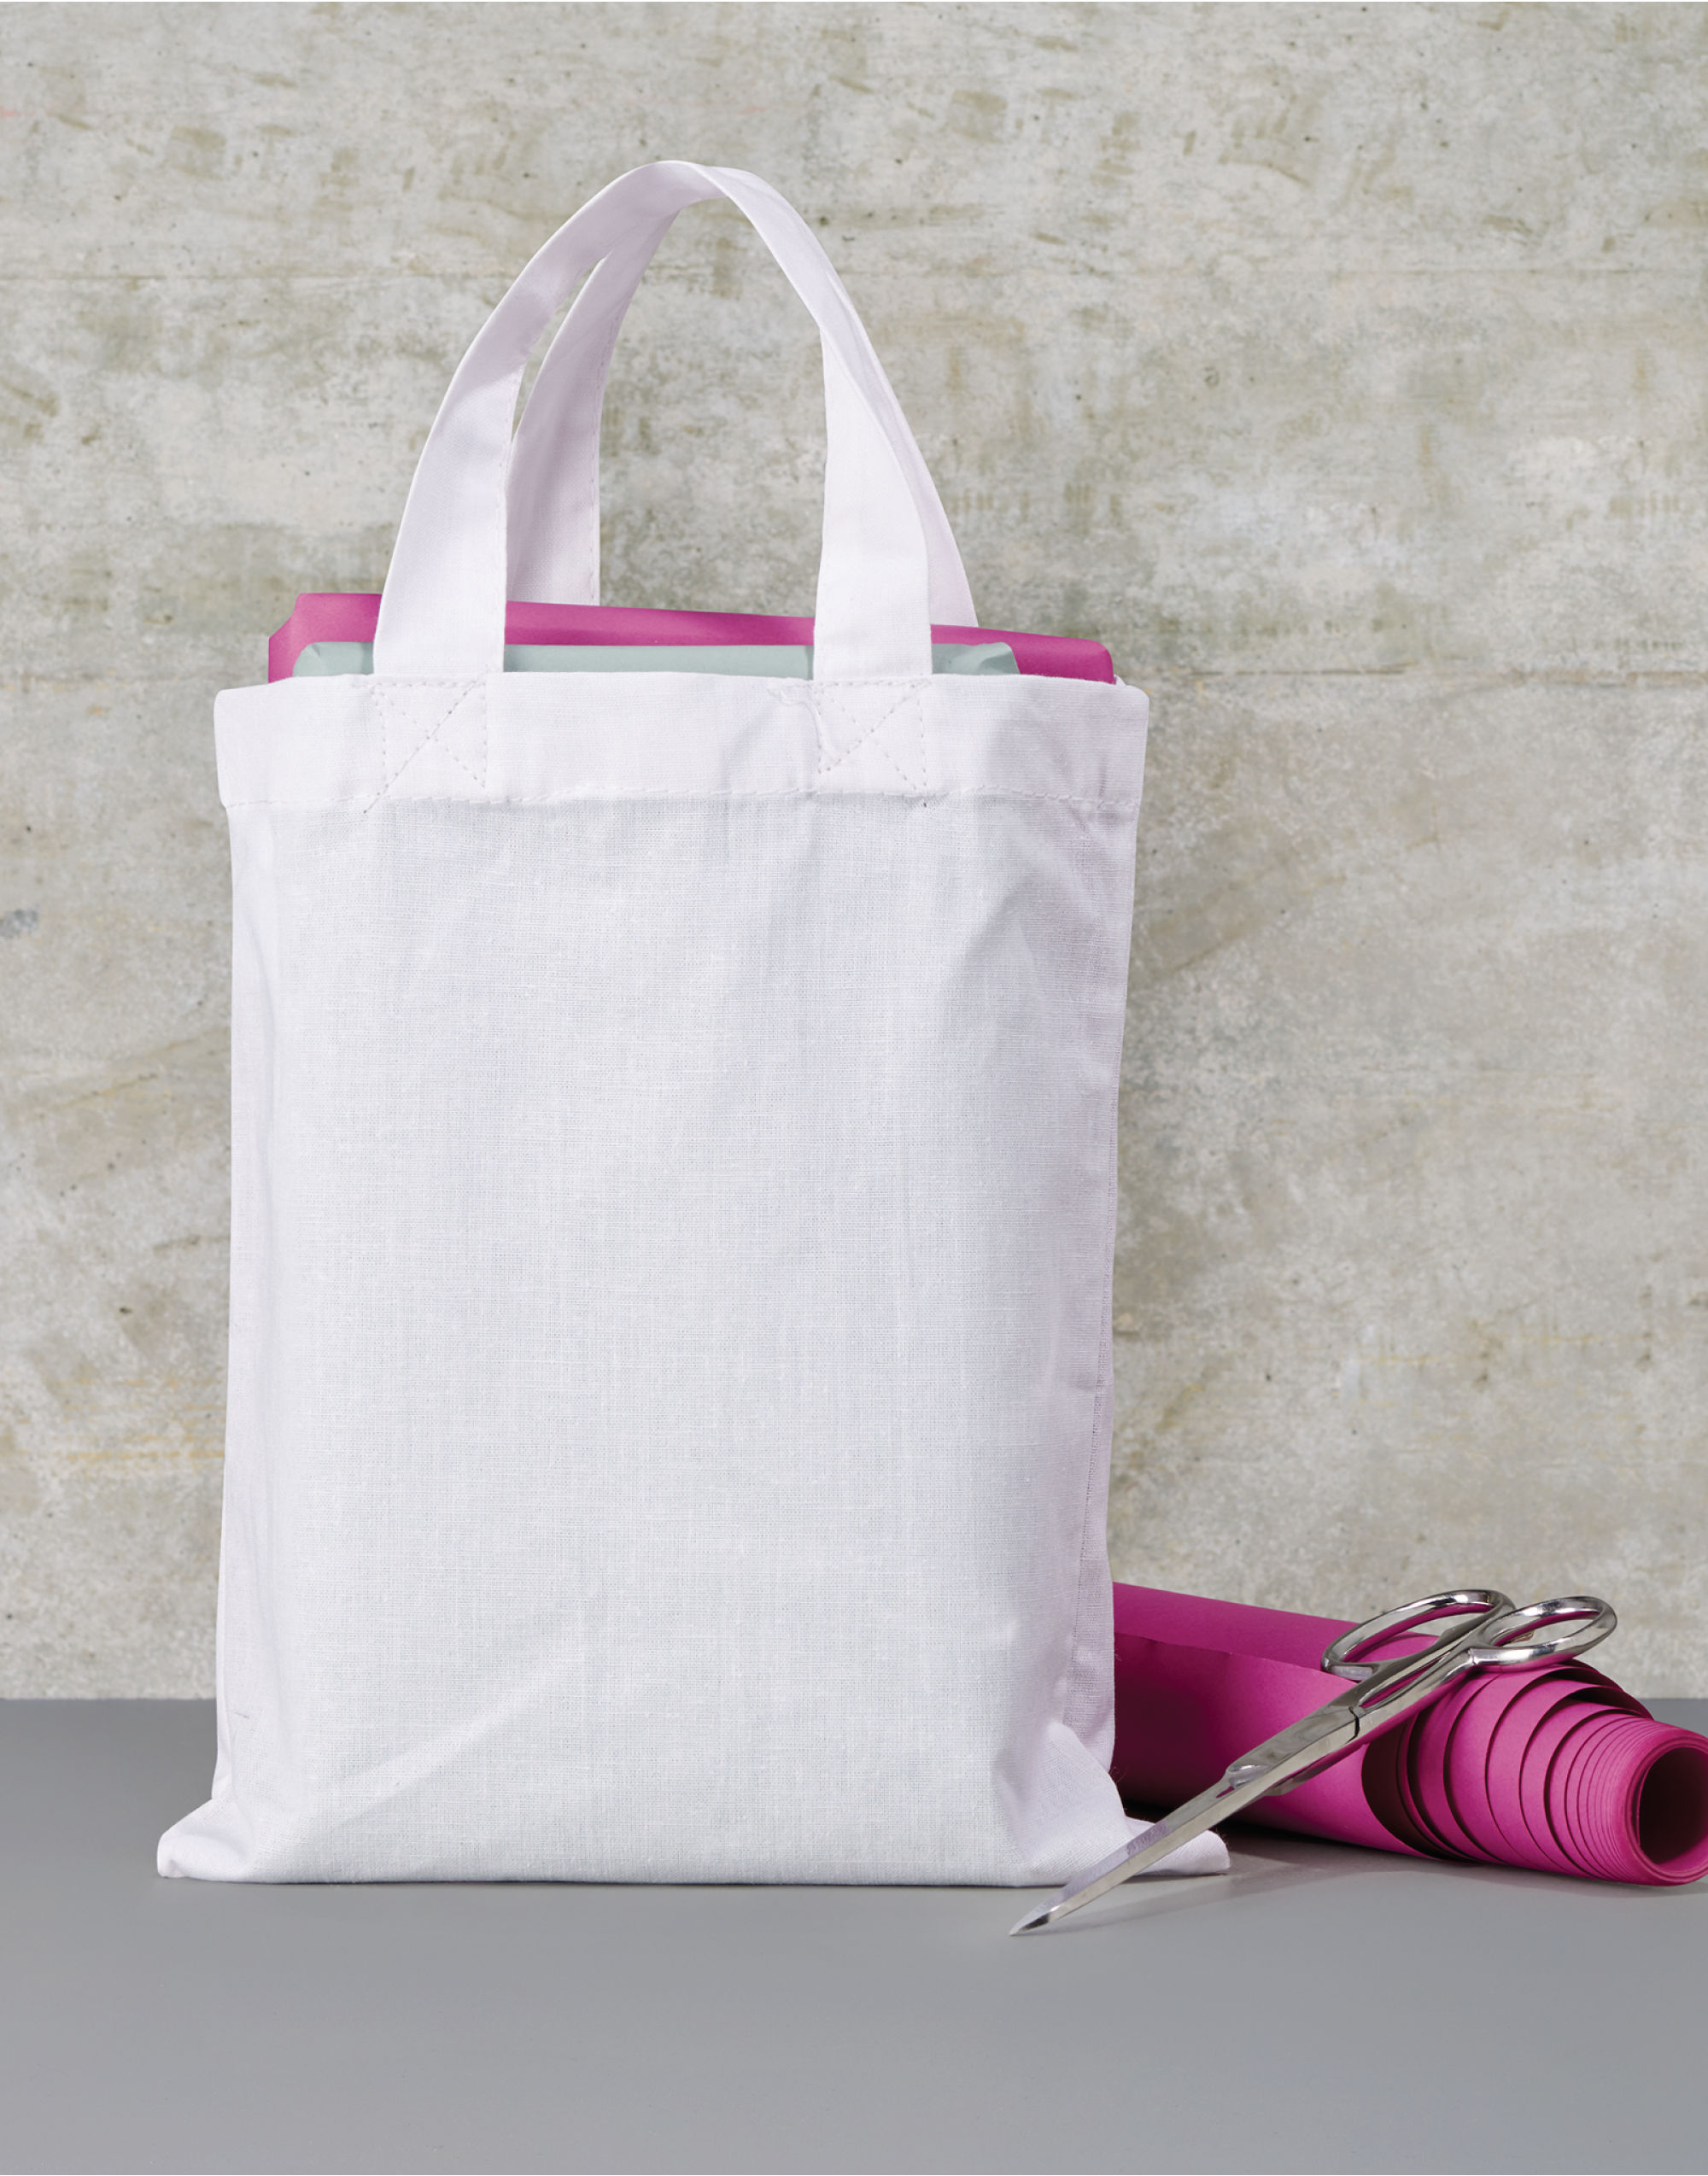 Bags By Jassz Pharmacy Bag